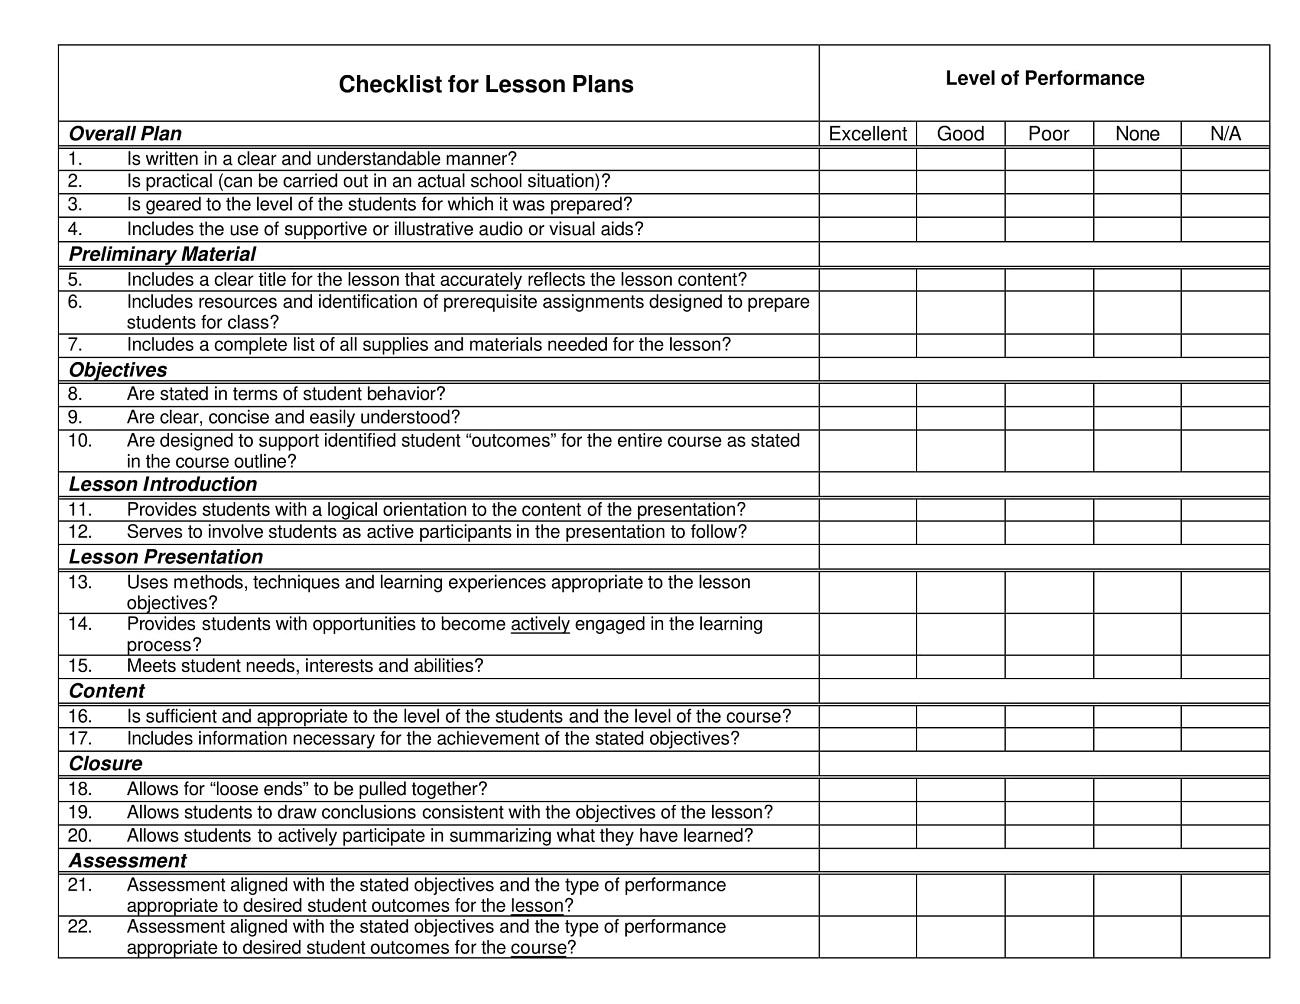 Lesson Plan Evaluation Checklist Template PDF